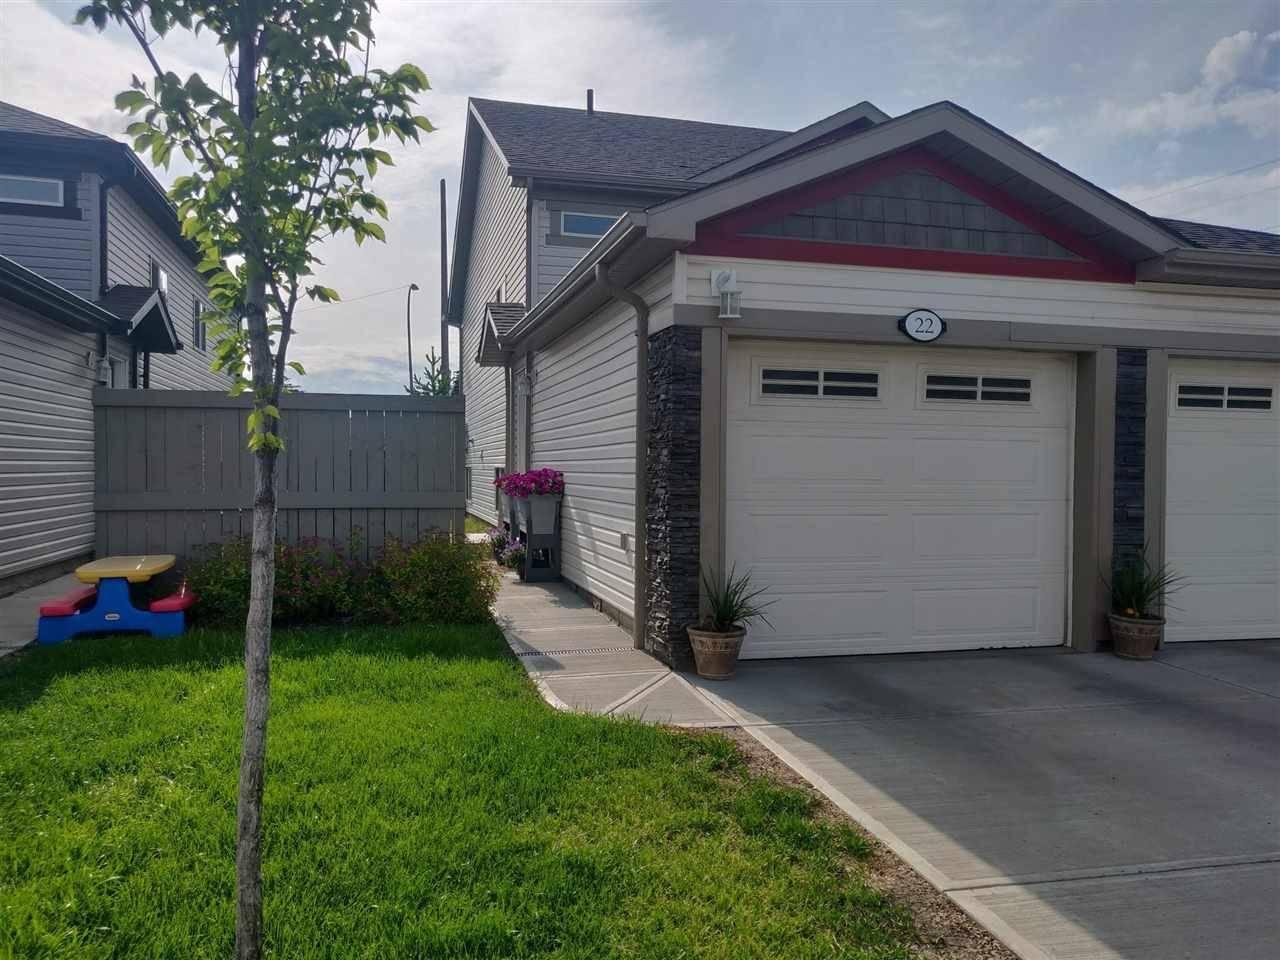 Townhouse for sale at 6520 2 Ave Sw Unit 22 Edmonton Alberta - MLS: E4159278